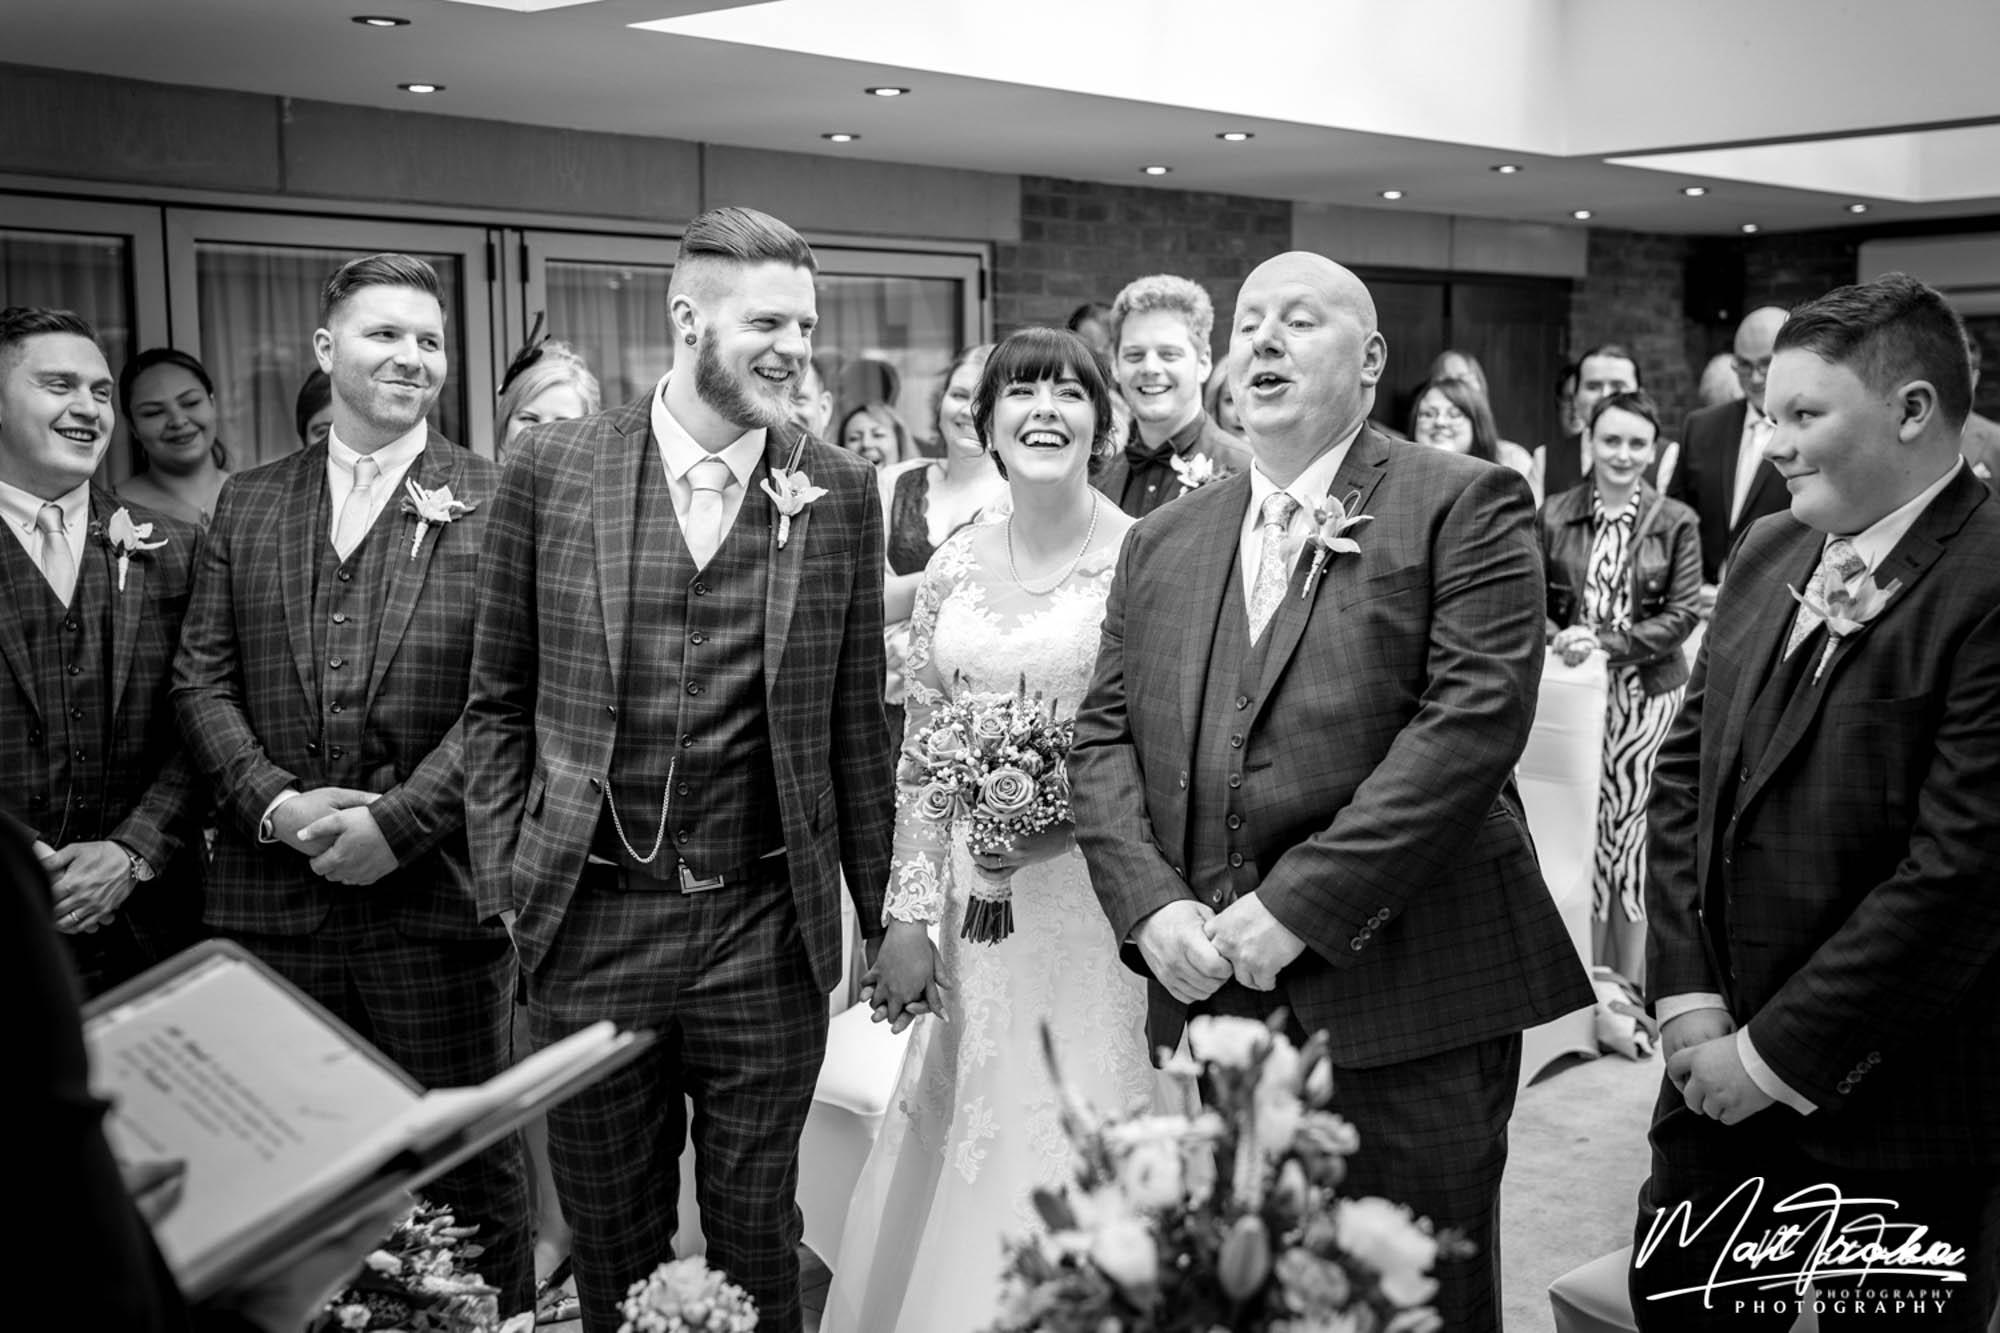 White Hart Inn Wedding Ceremony, Annesley, Derby